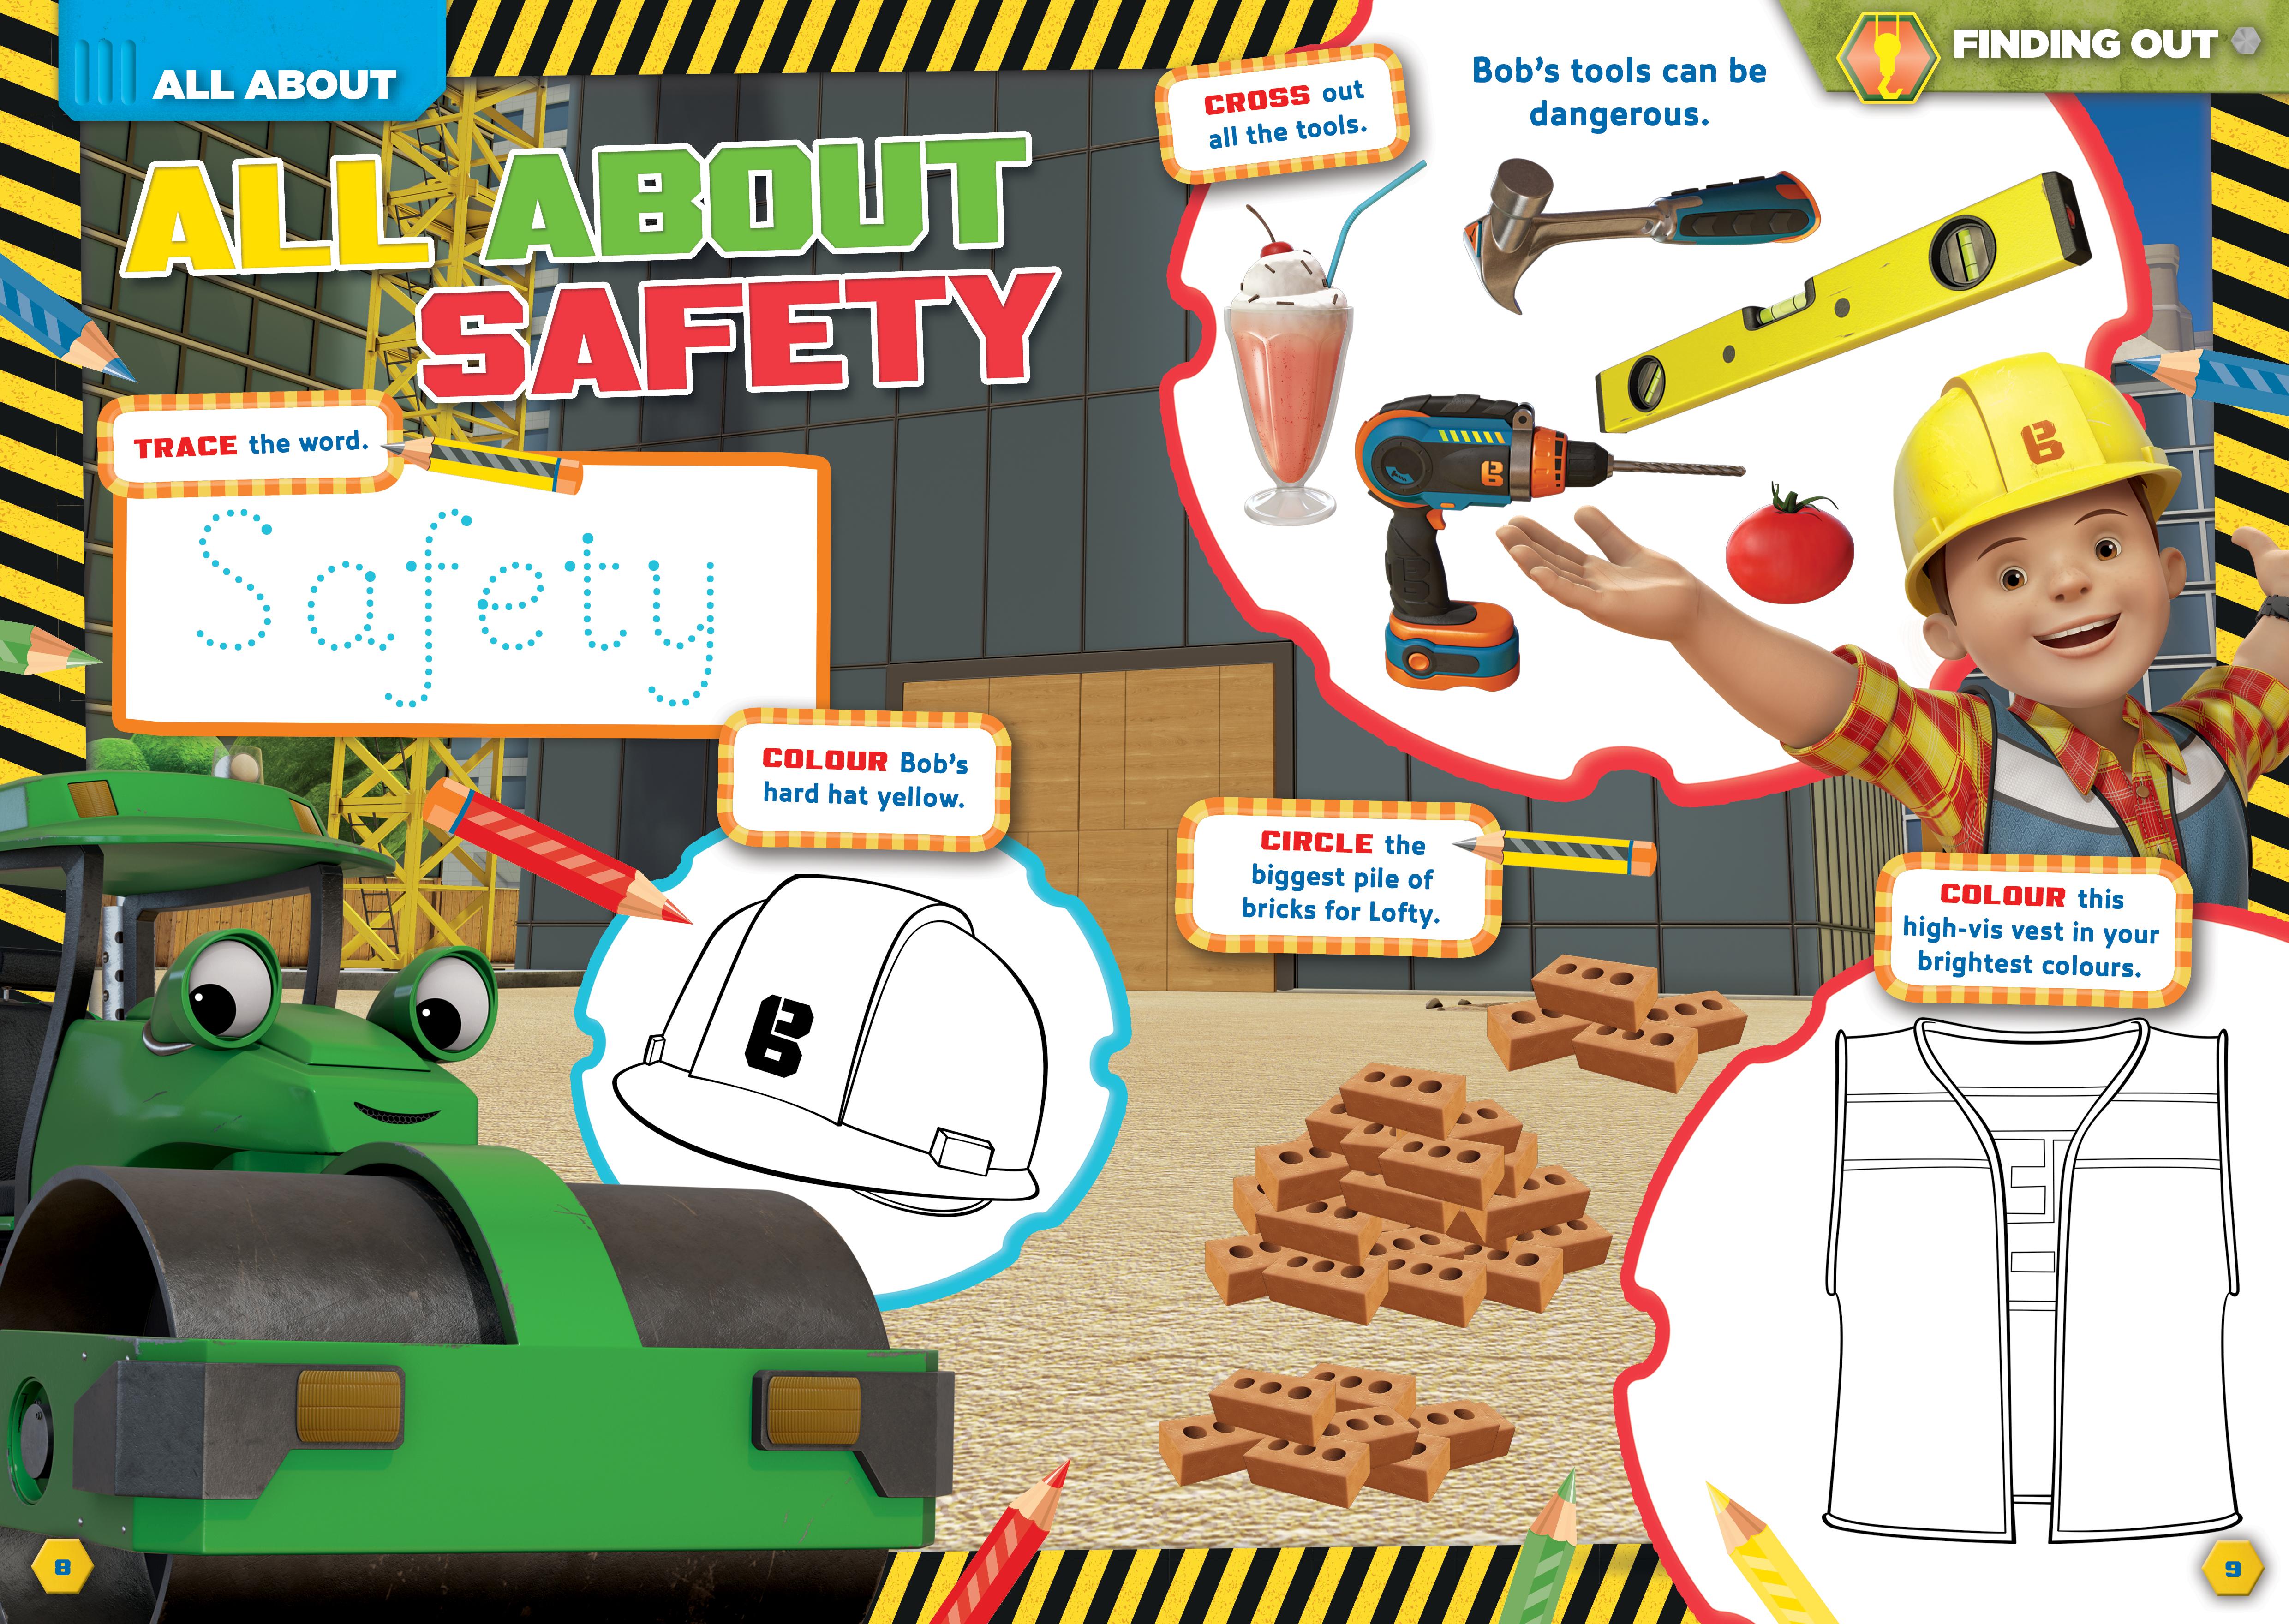 bob_257_p8-9_safety